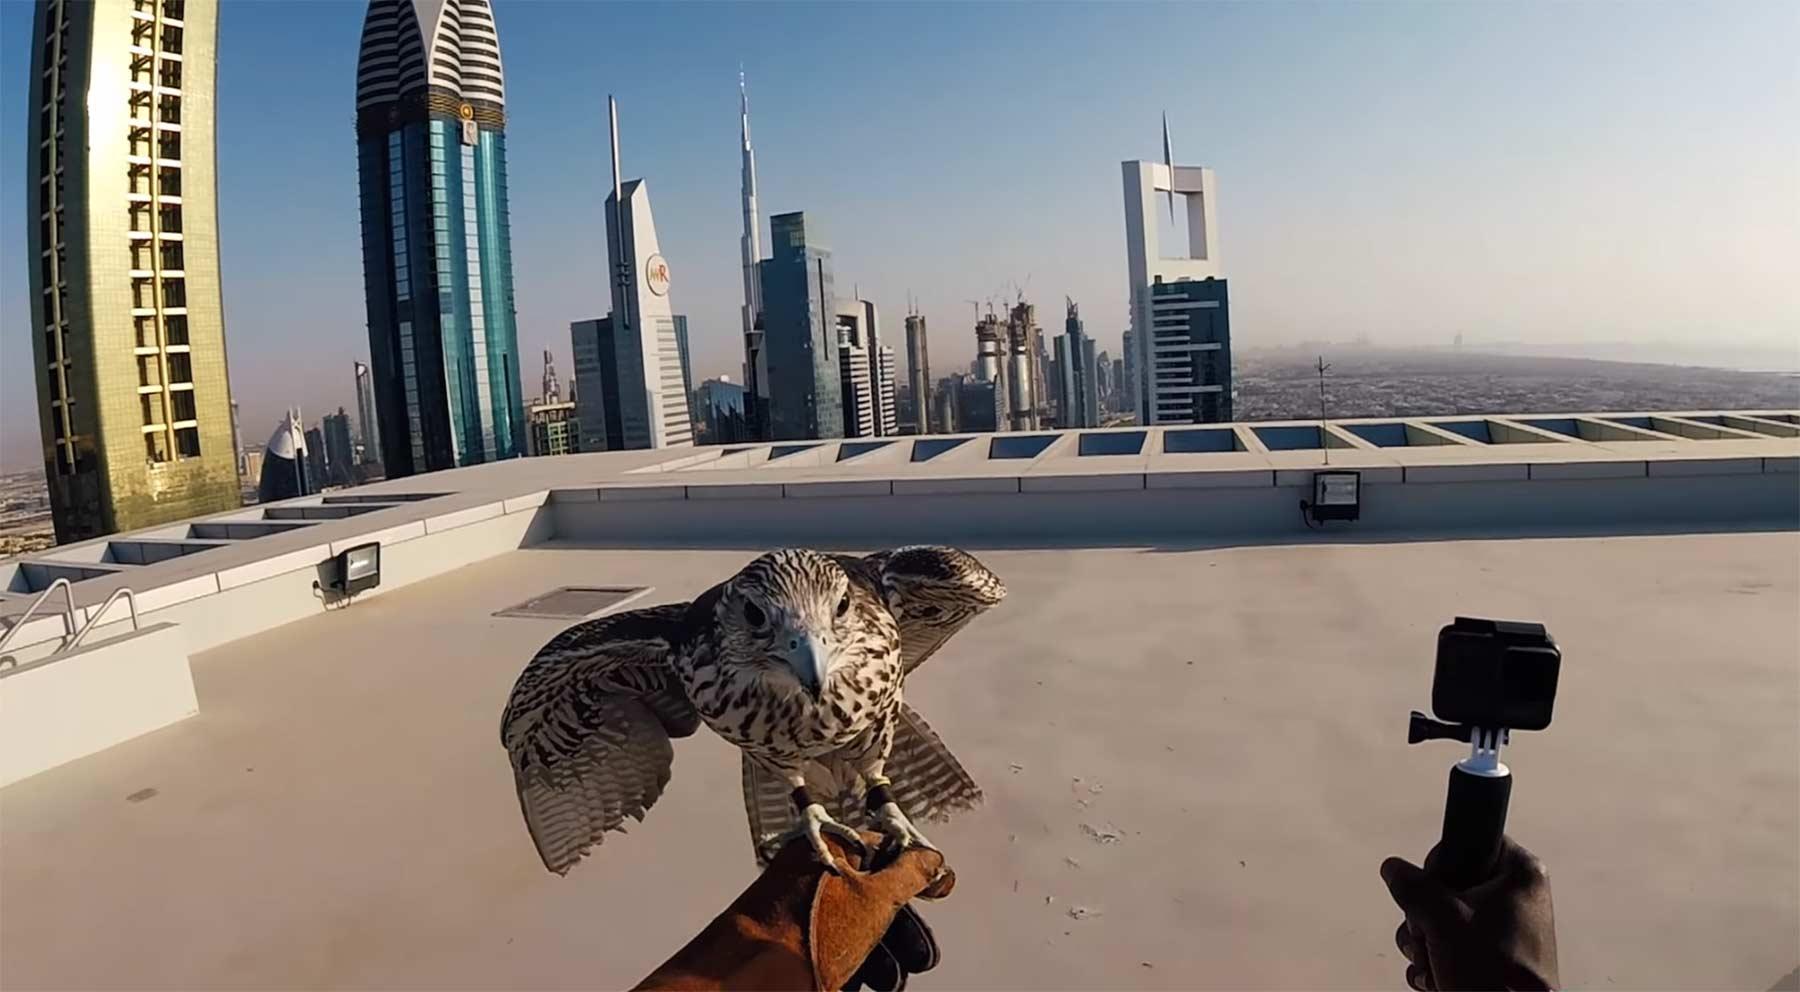 Nigel Sylvester – GO! 4 | Dubai nigel-sylvester-go-4-dubai